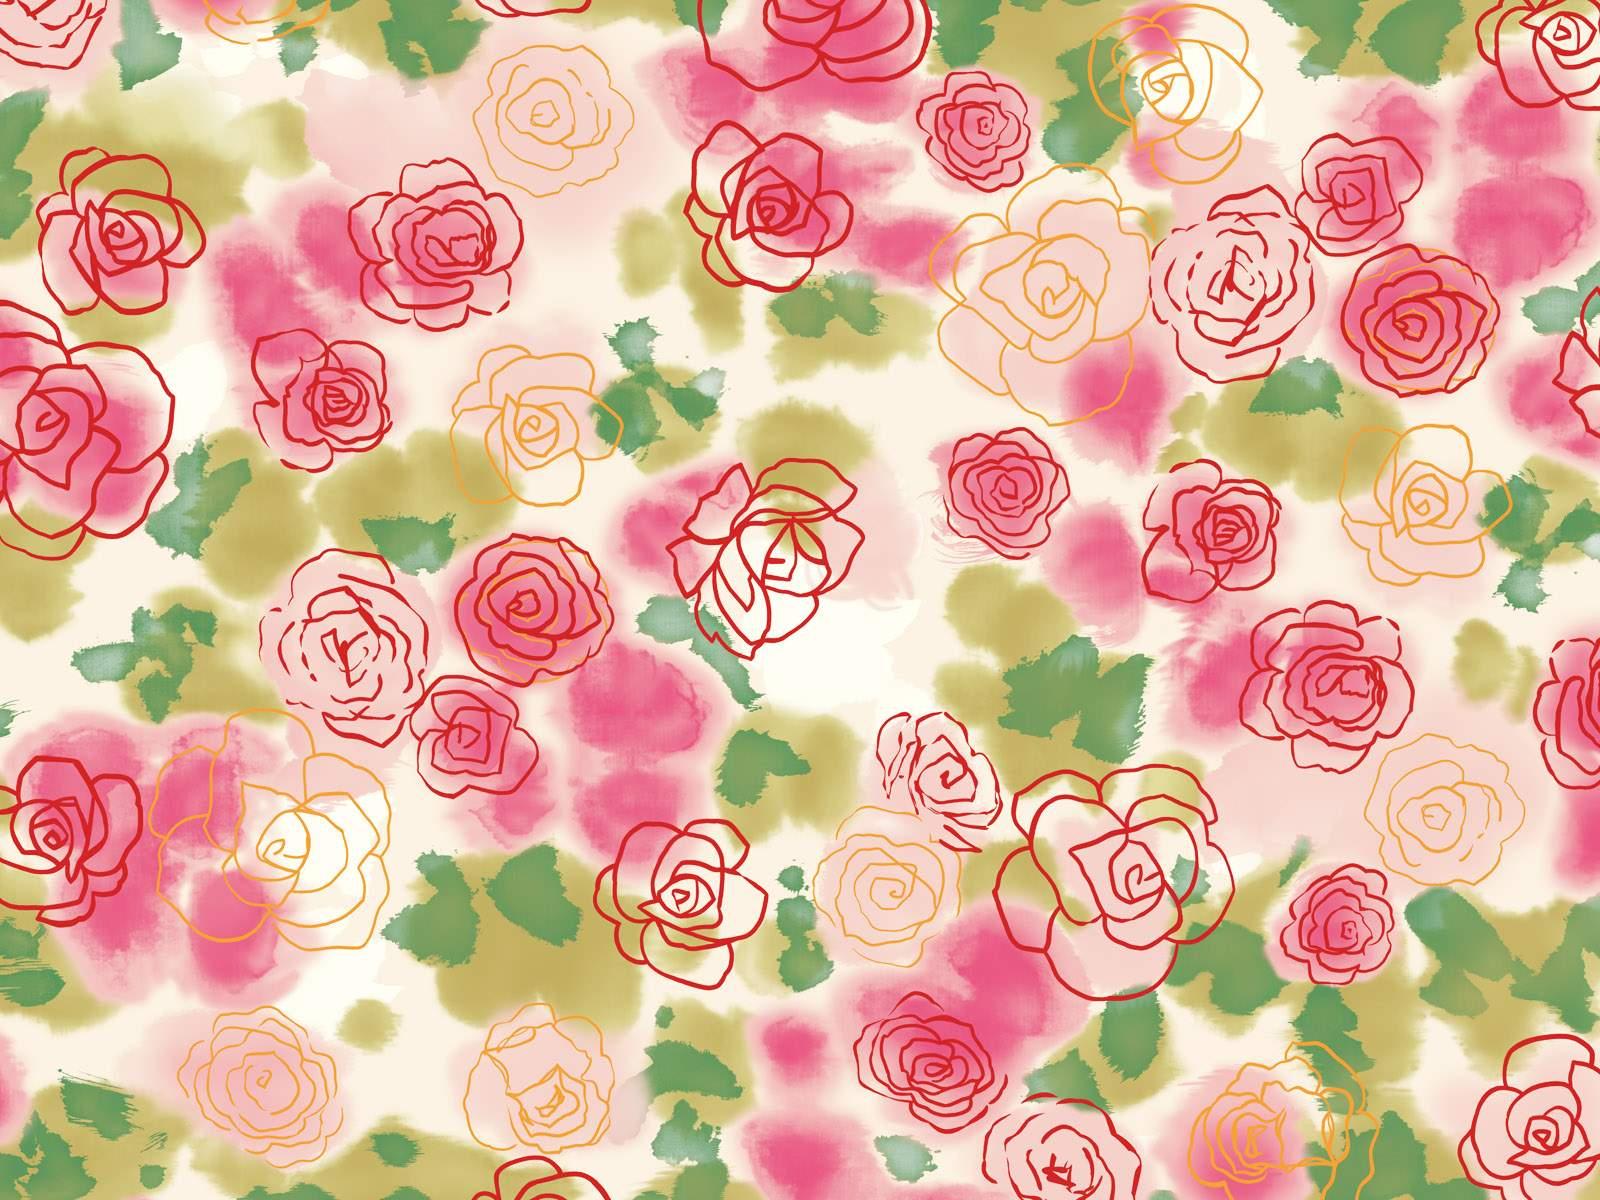 Watercolor Flowers Desktop Wallpapers Top Free Watercolor